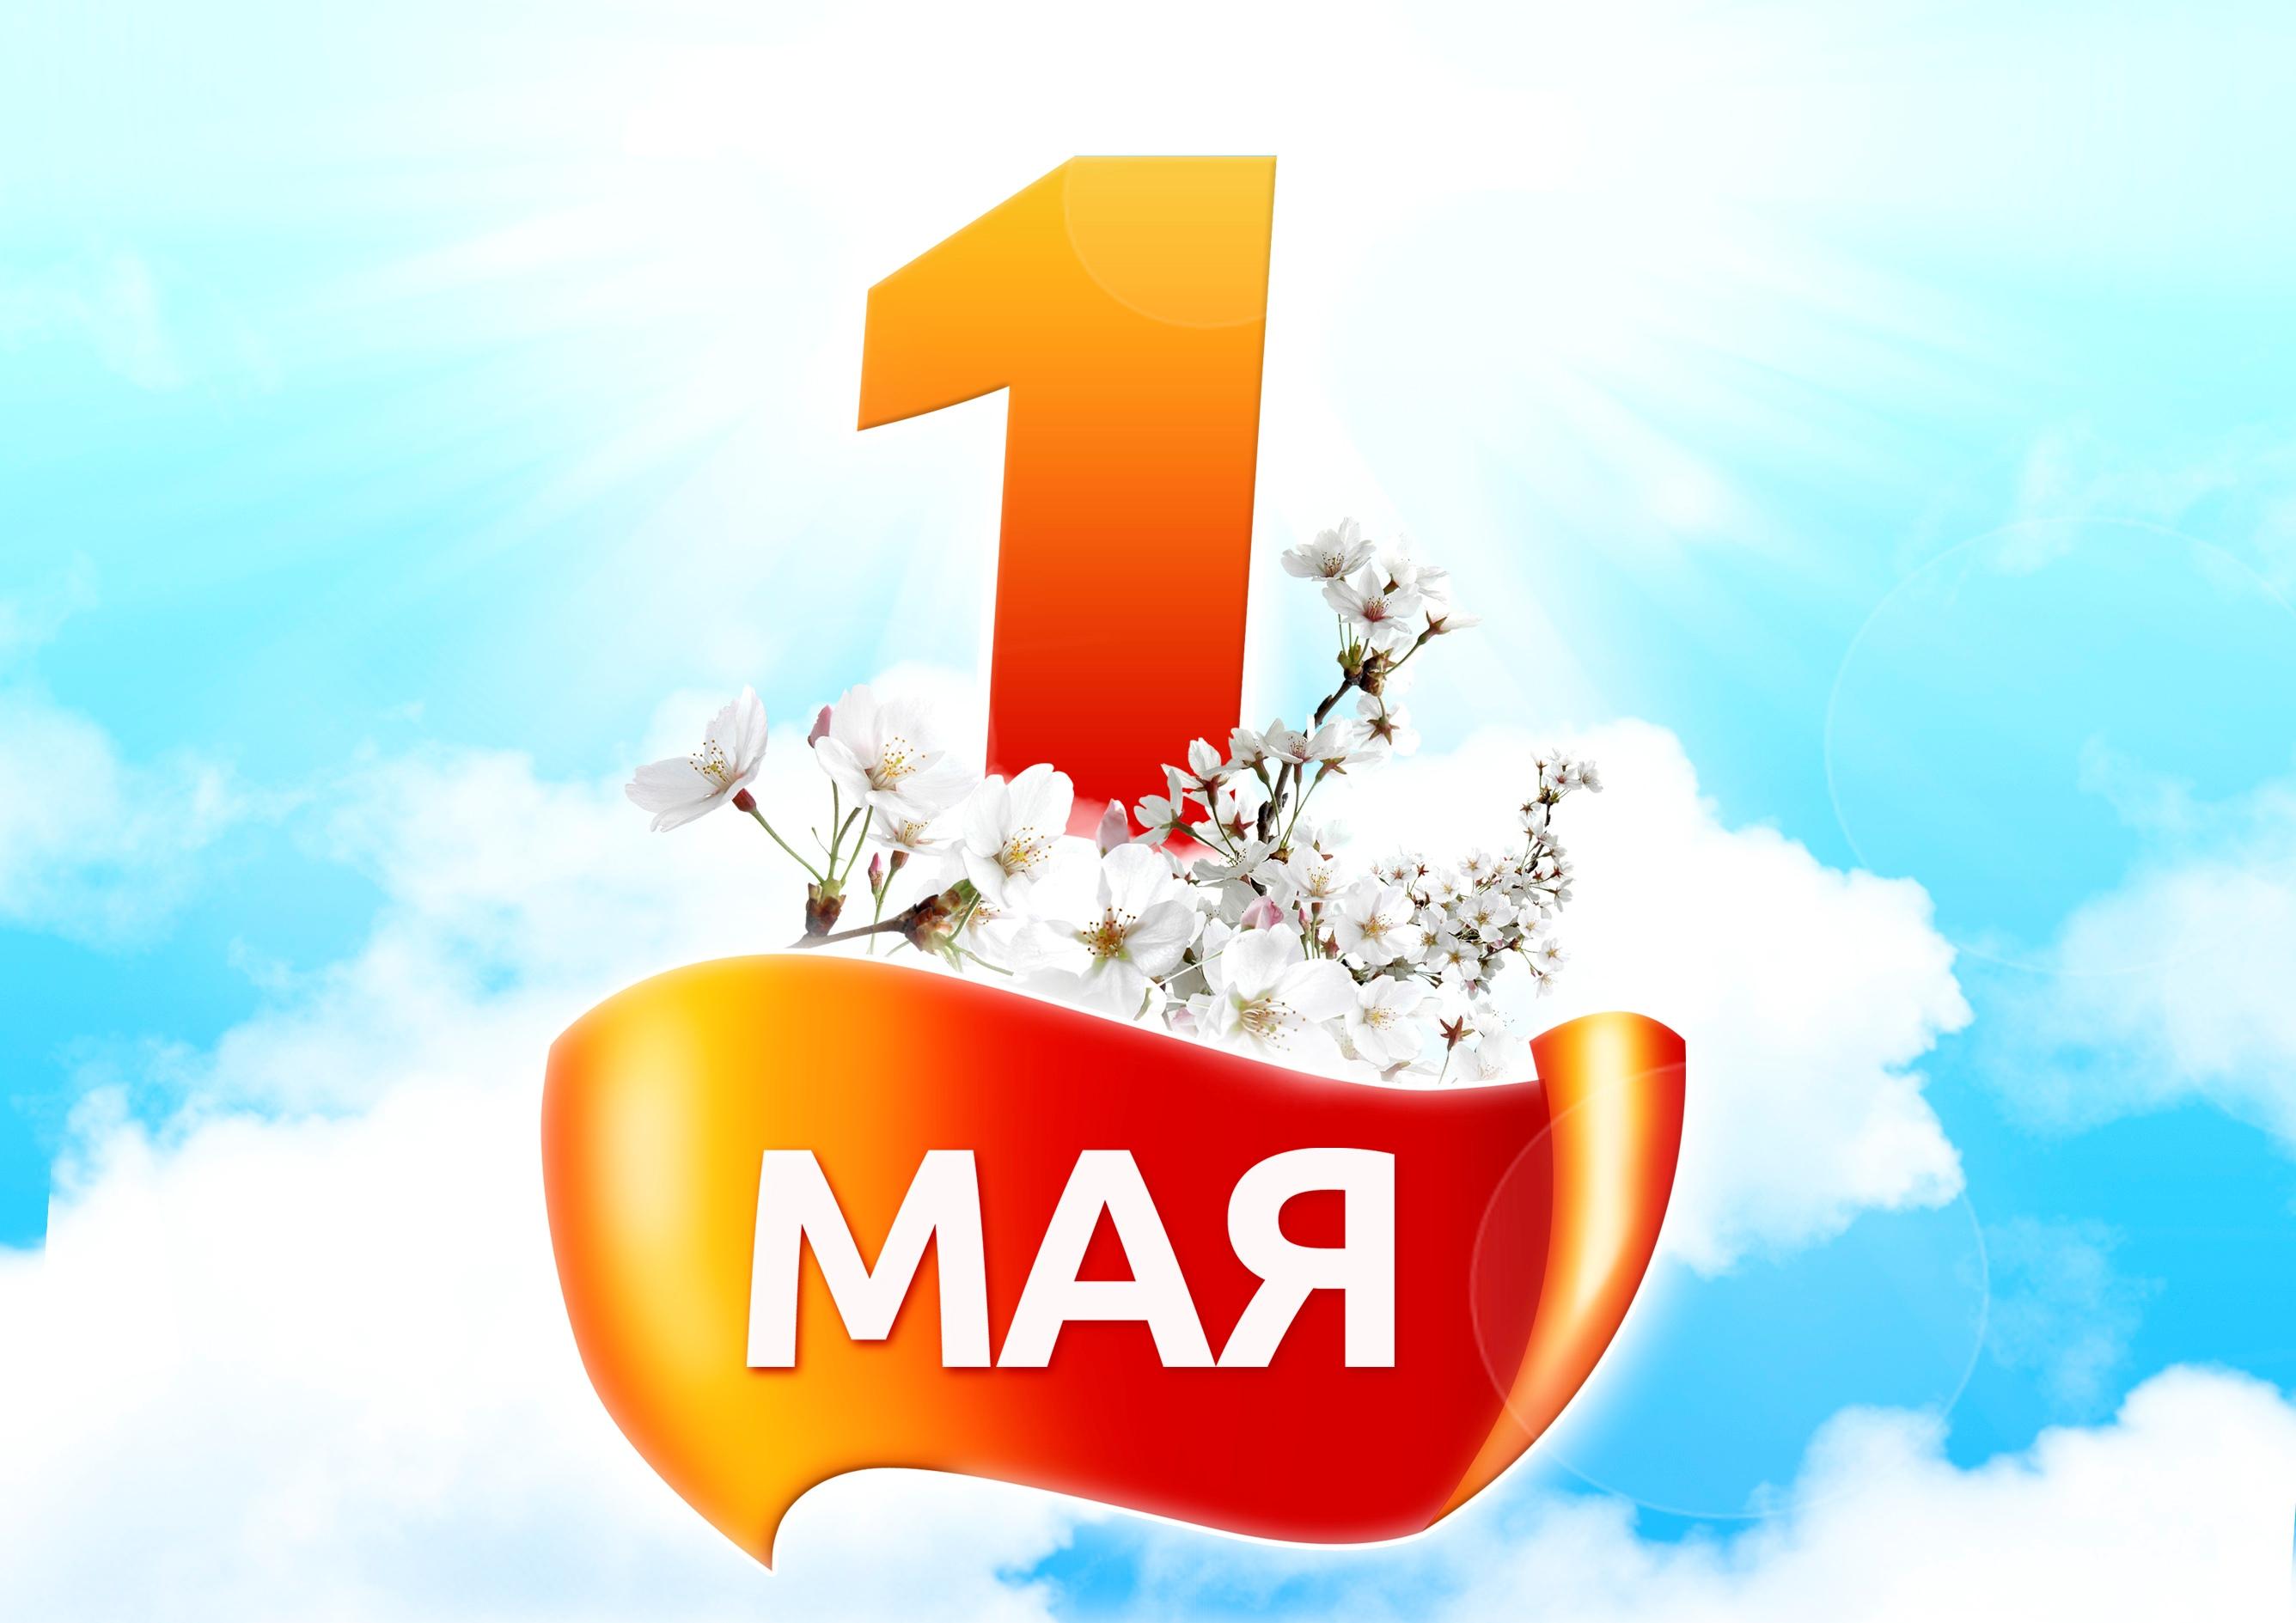 https://www.ural.org/wp-content/uploads/2015/05/1-maya-prazdnik-vesny-i-truda-www-ural-org.jpg